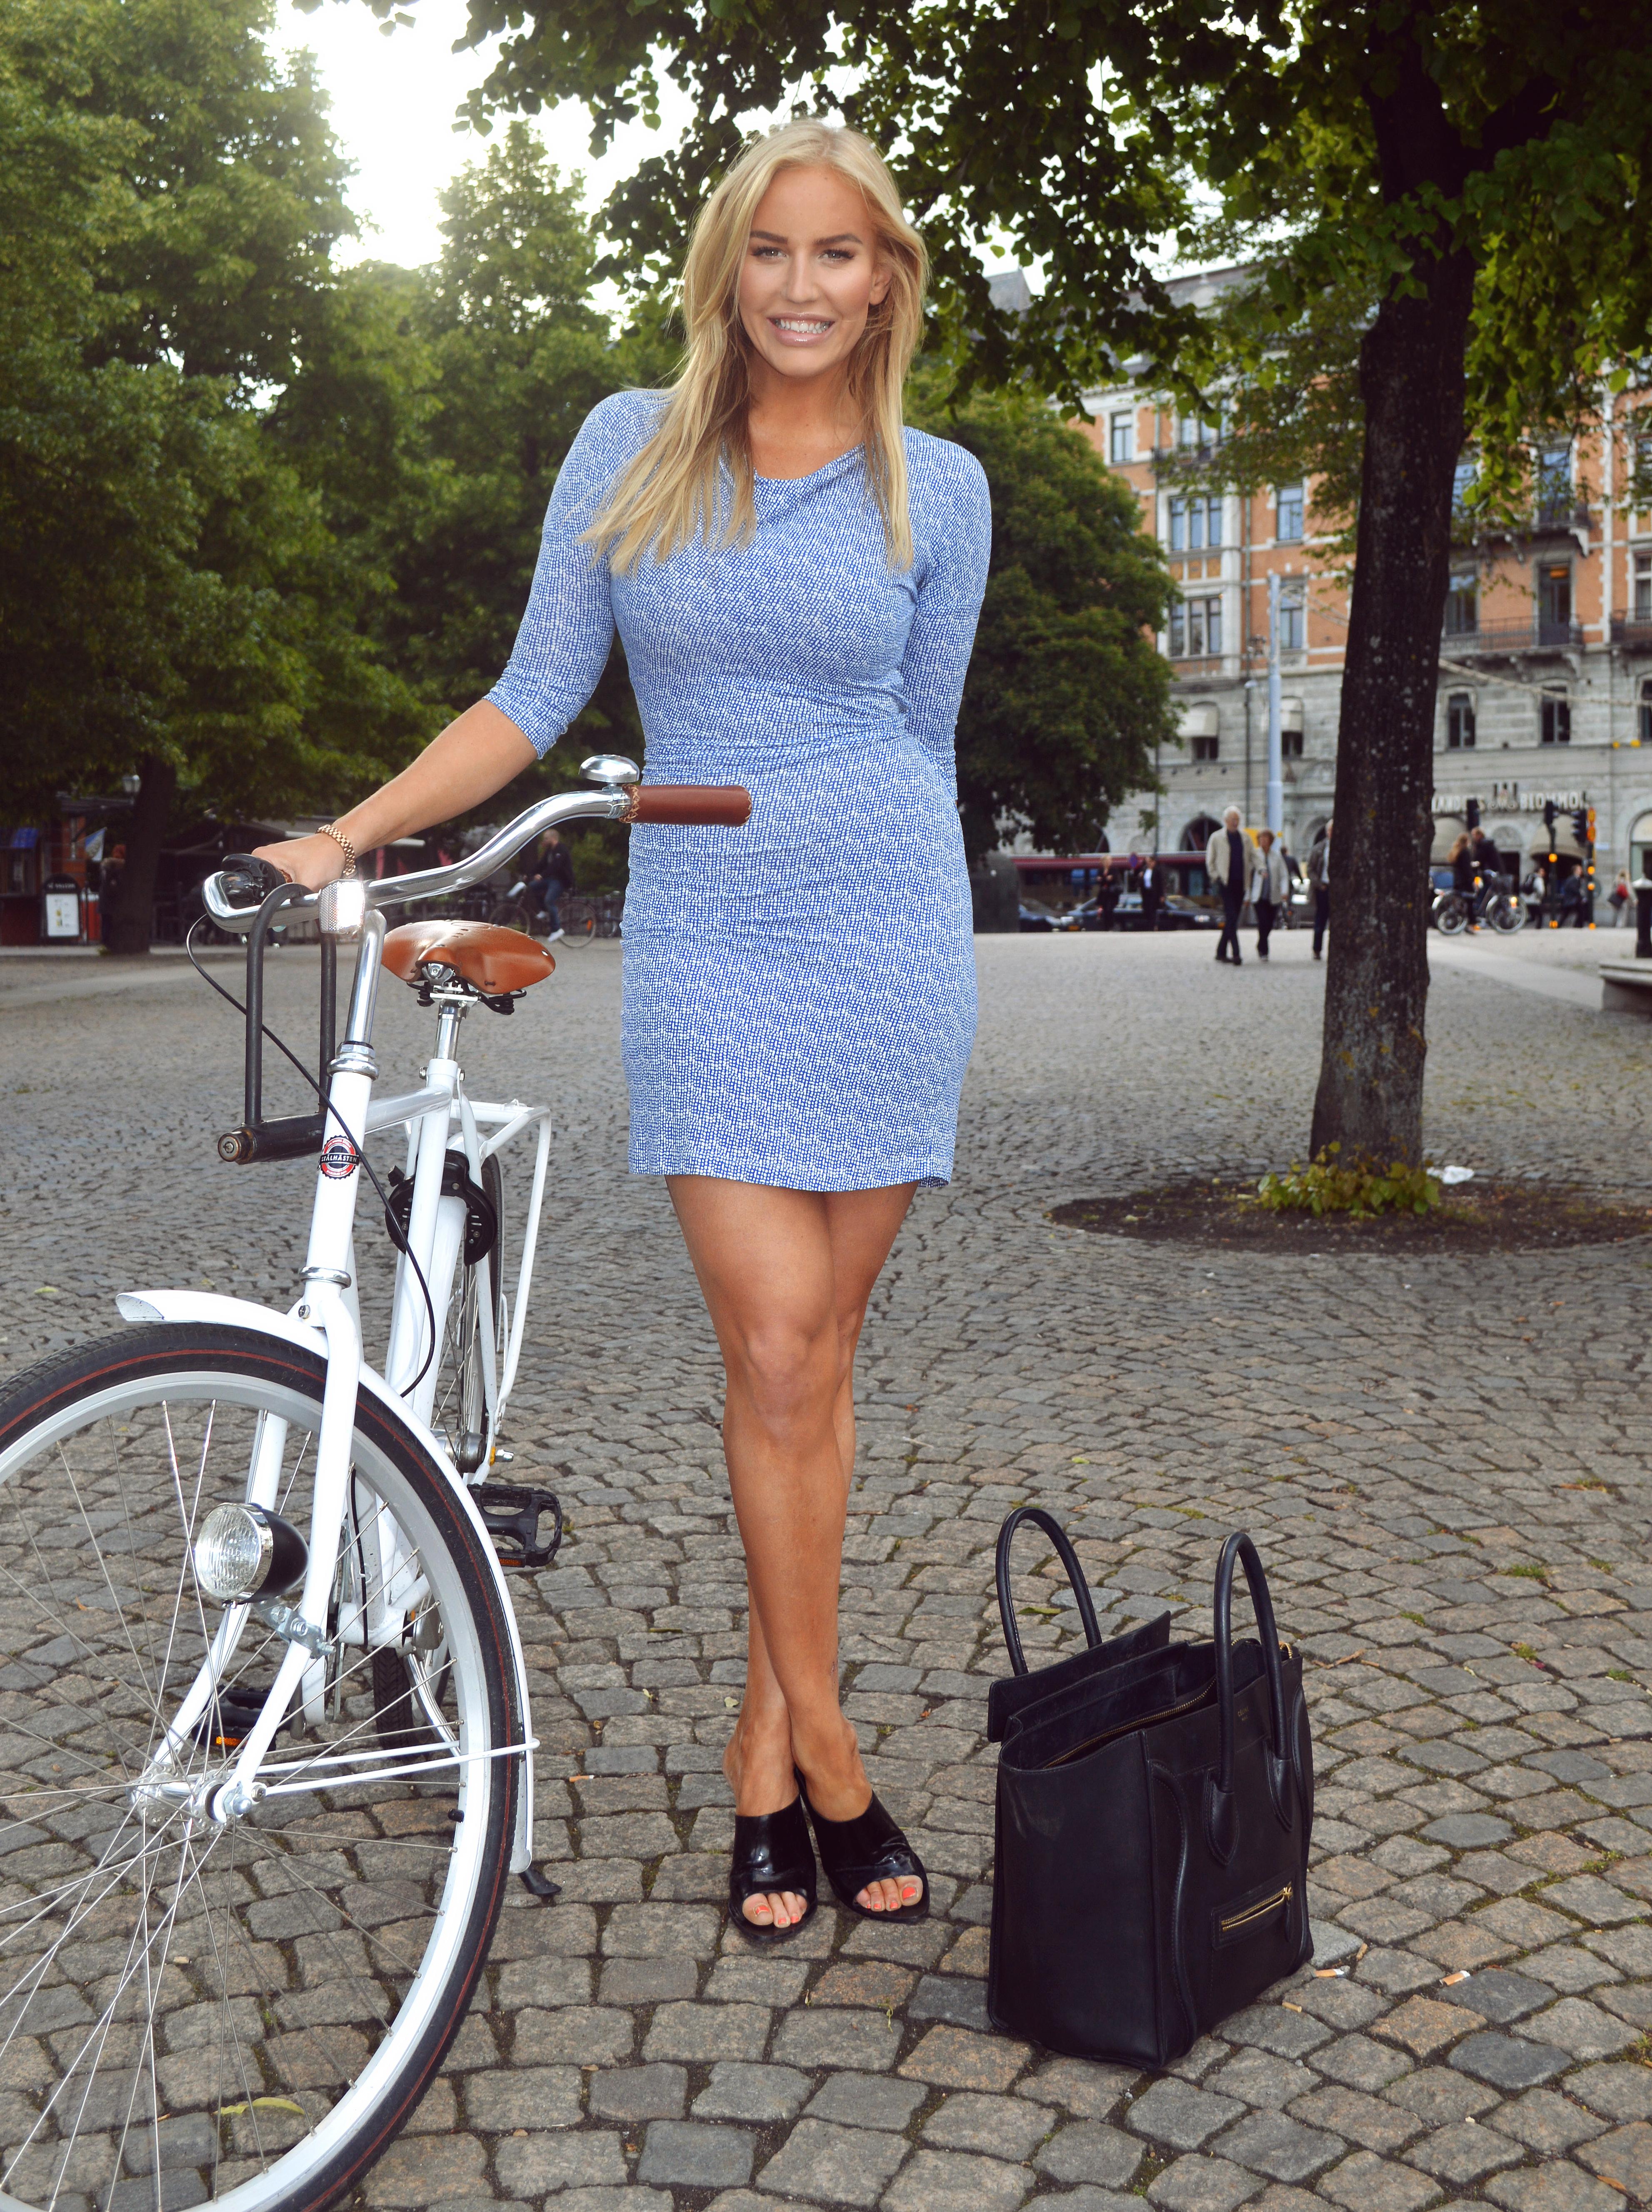 The Dress! Petra Tungården